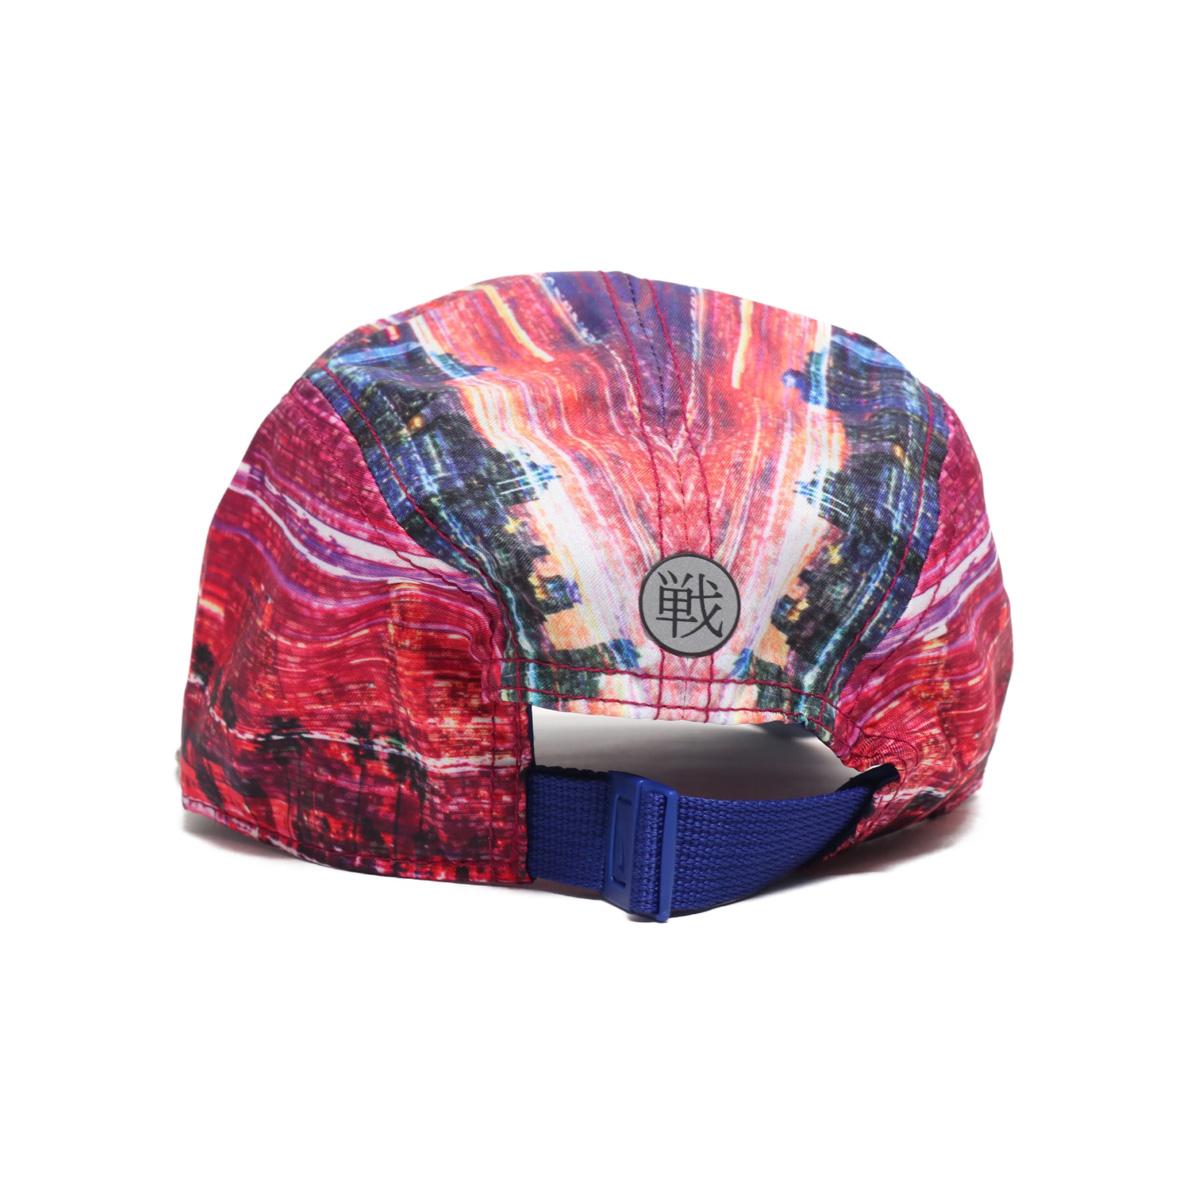 203df2f4768 NIKE U NRG AW84 CAP ZM SPECTRUM QS (DEEP ROYAL BLUE) (Nike LAB AW84 ZM  spectrum cap)